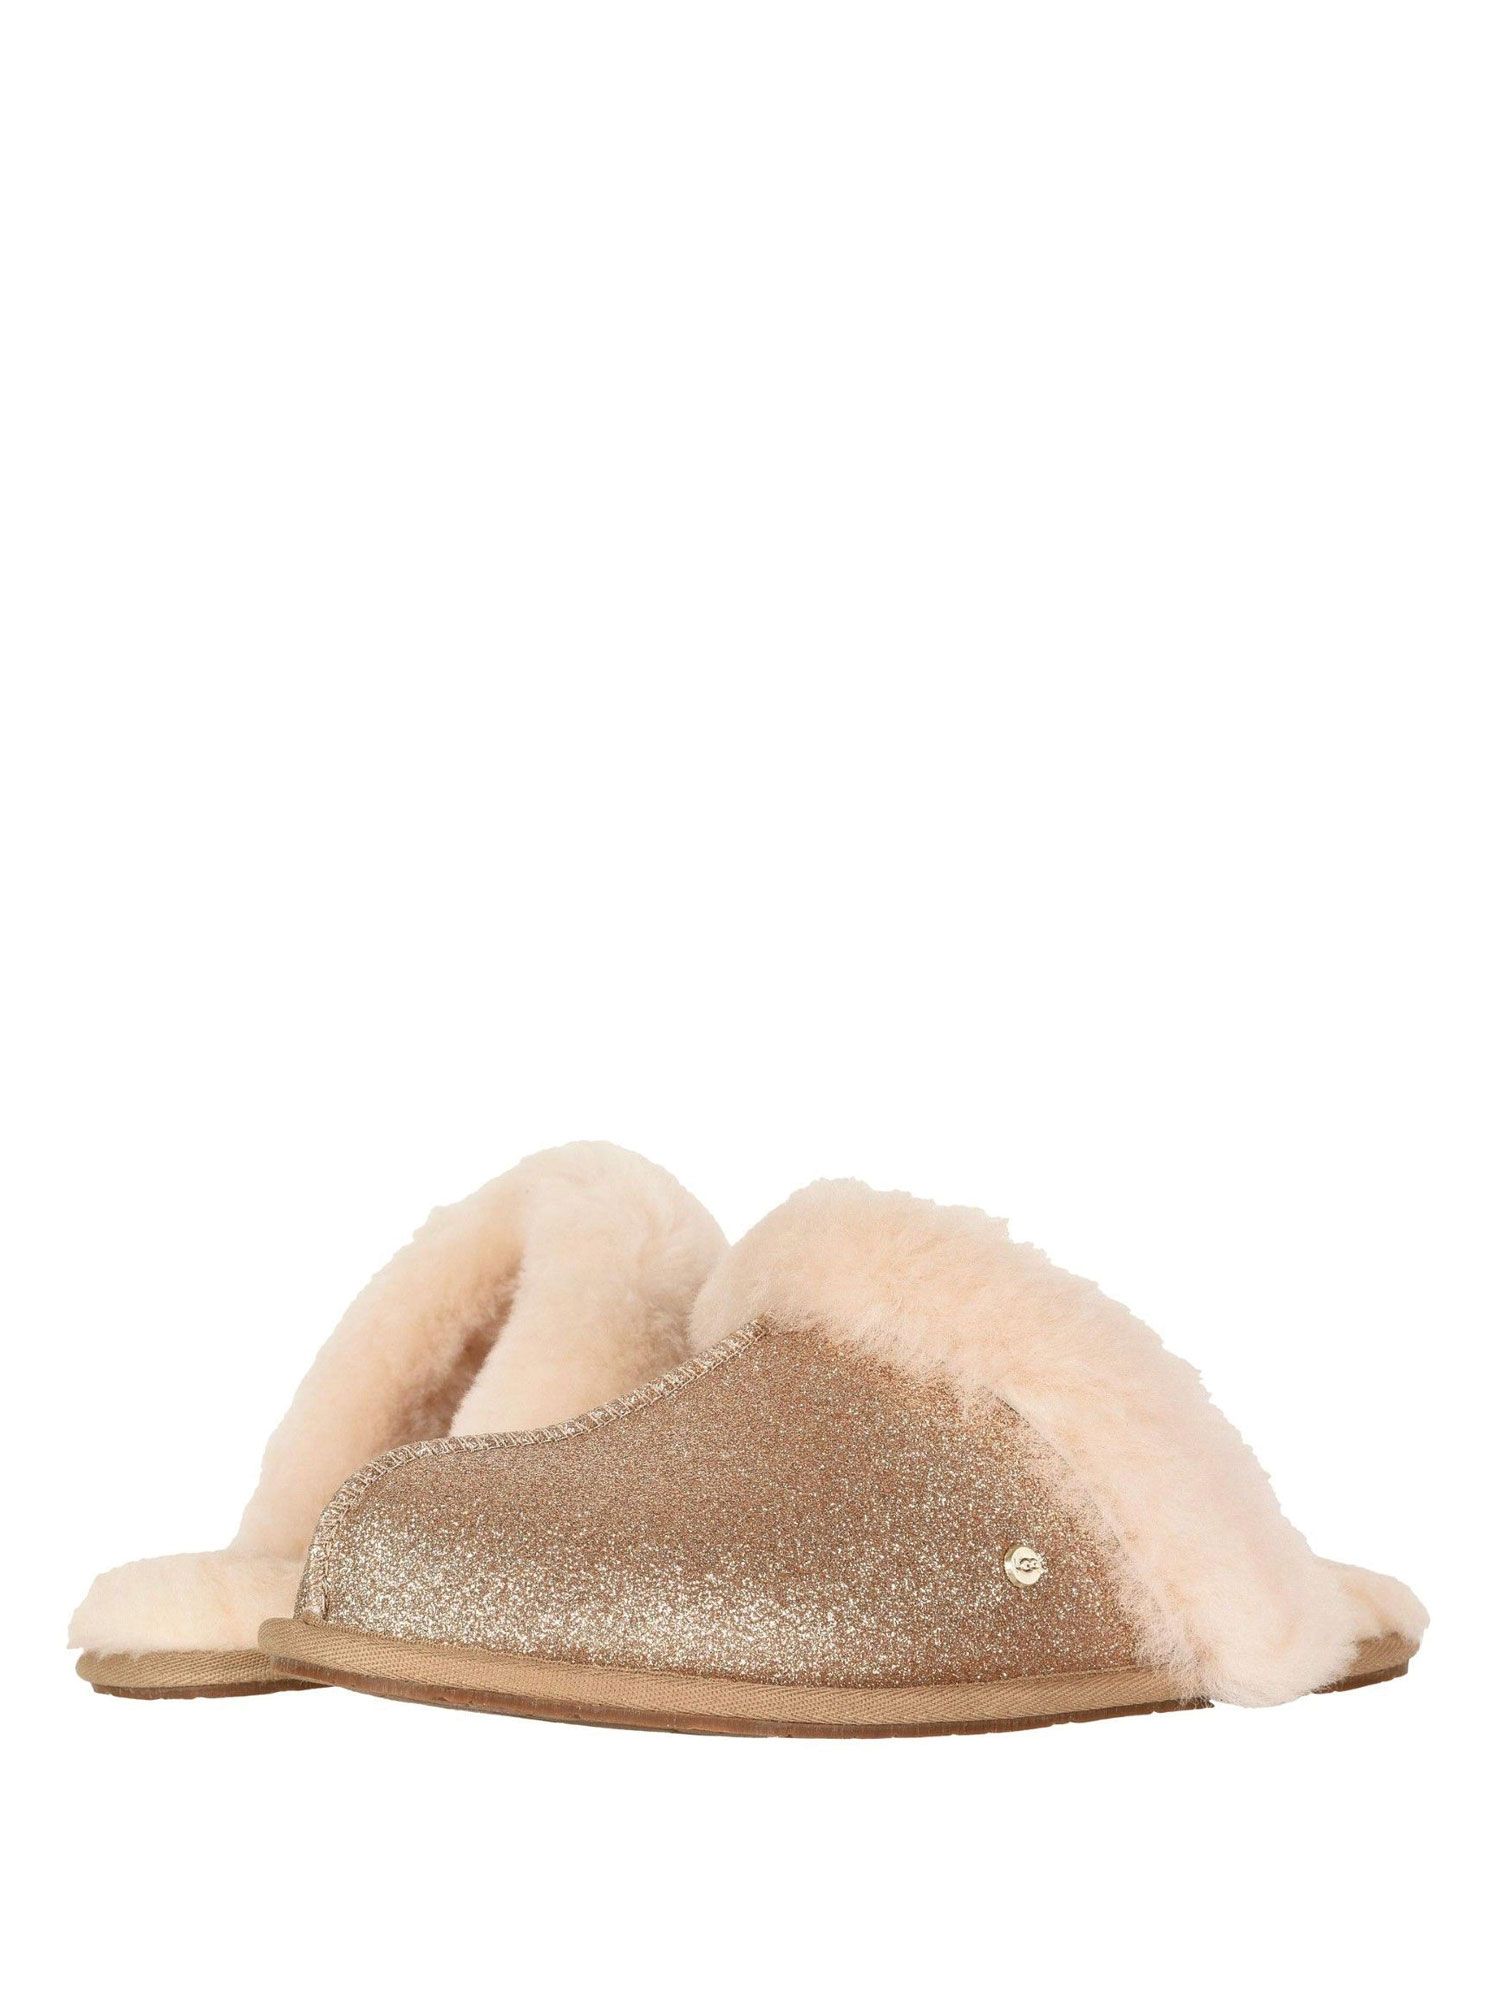 749afba5fcf1 ugg - ugg scuffette ii sparkle women s slippers 1100177 - Walmart.com